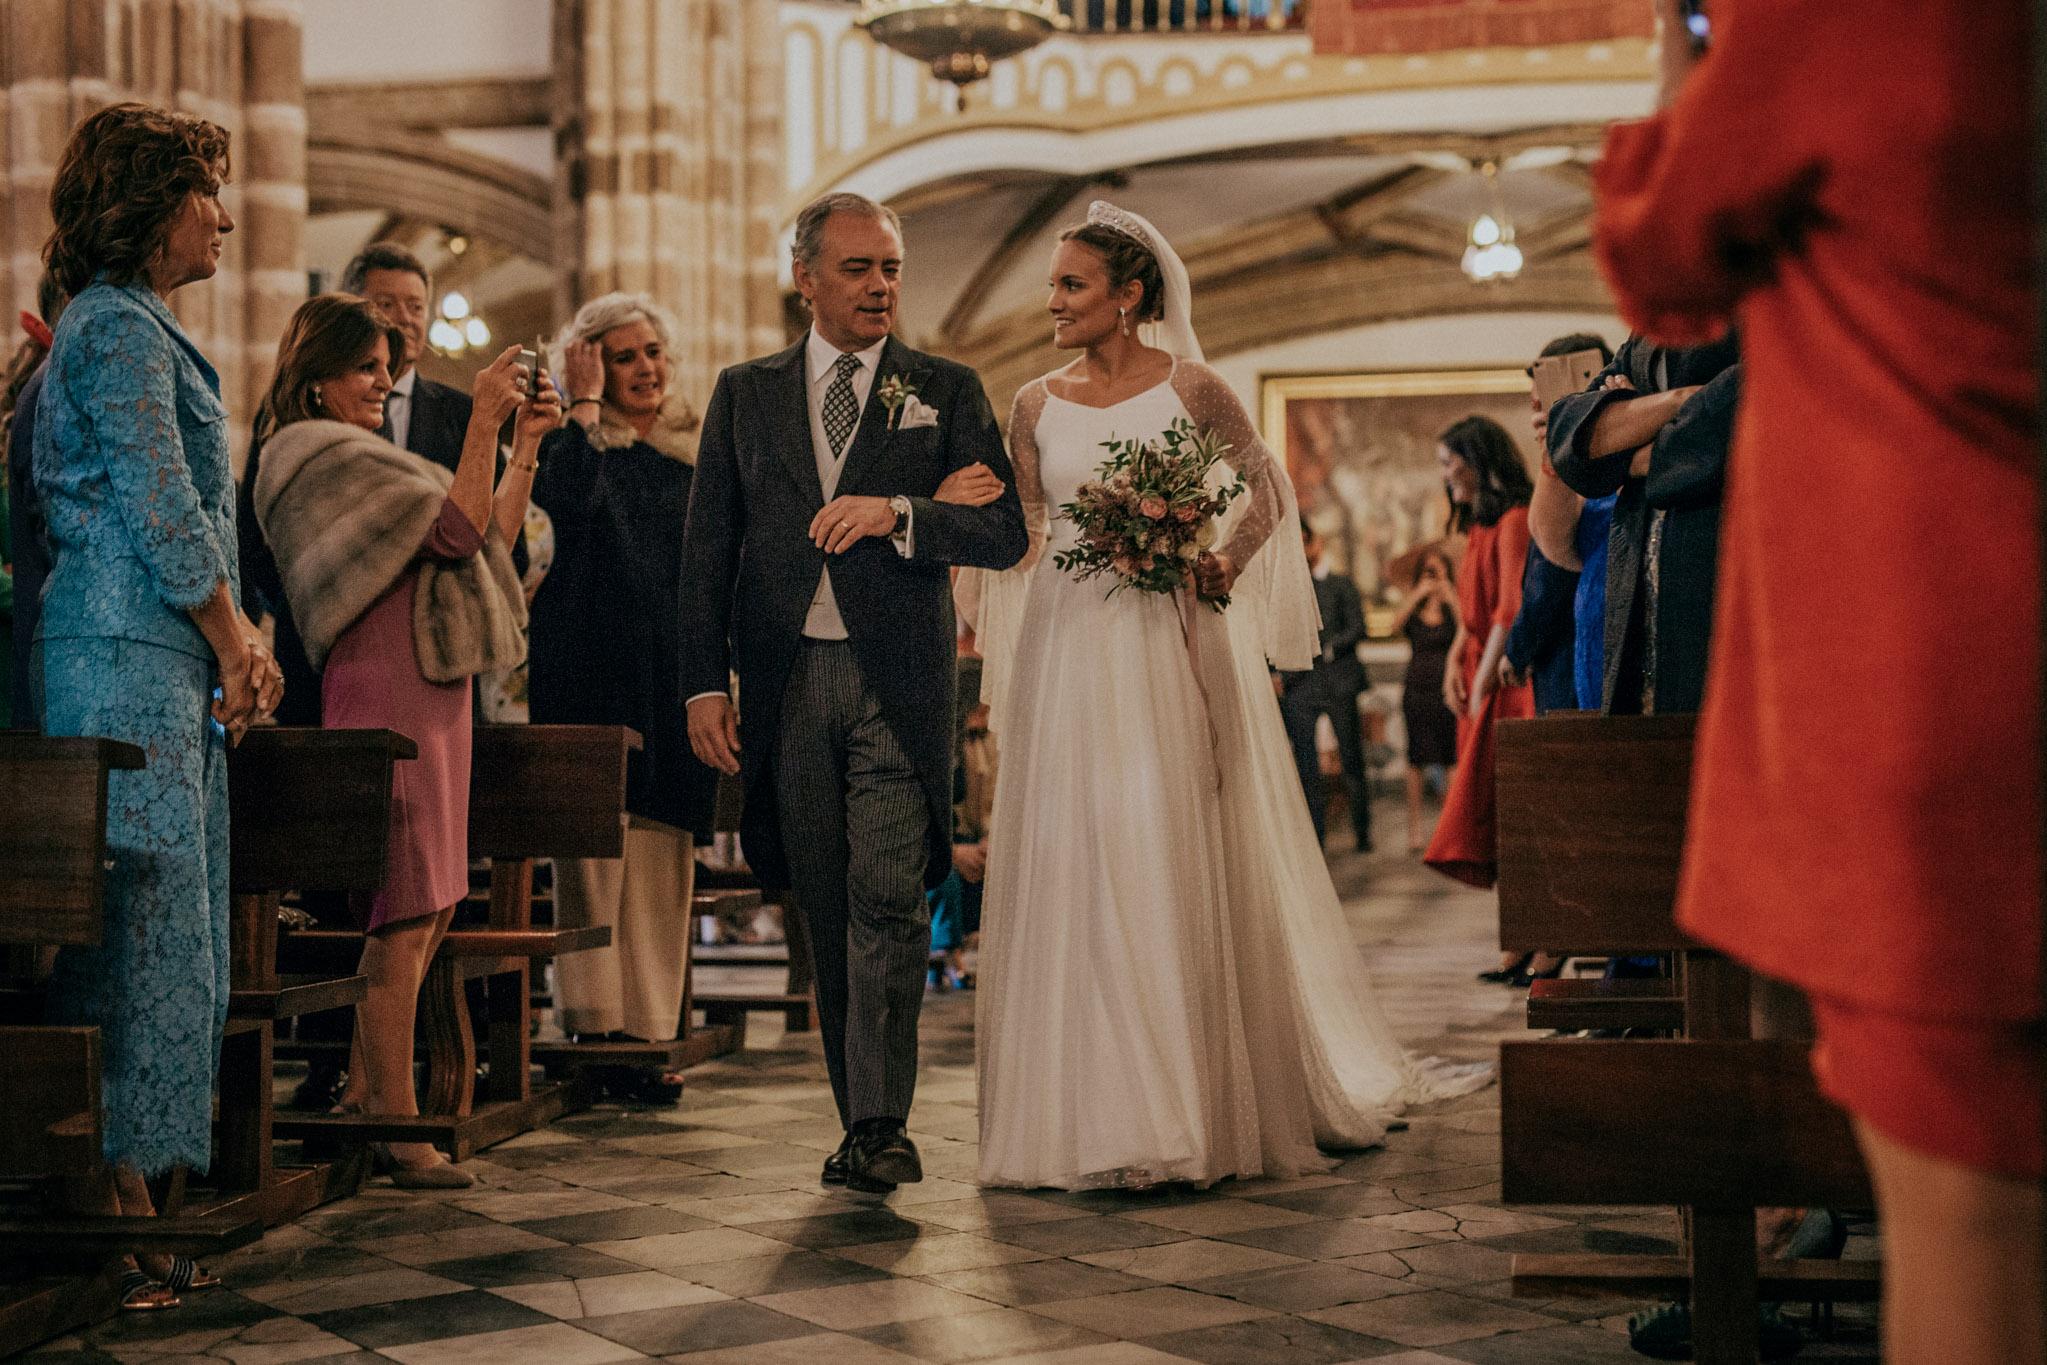 fotografia-boda-wedding-photographer-spain-concorazon-110